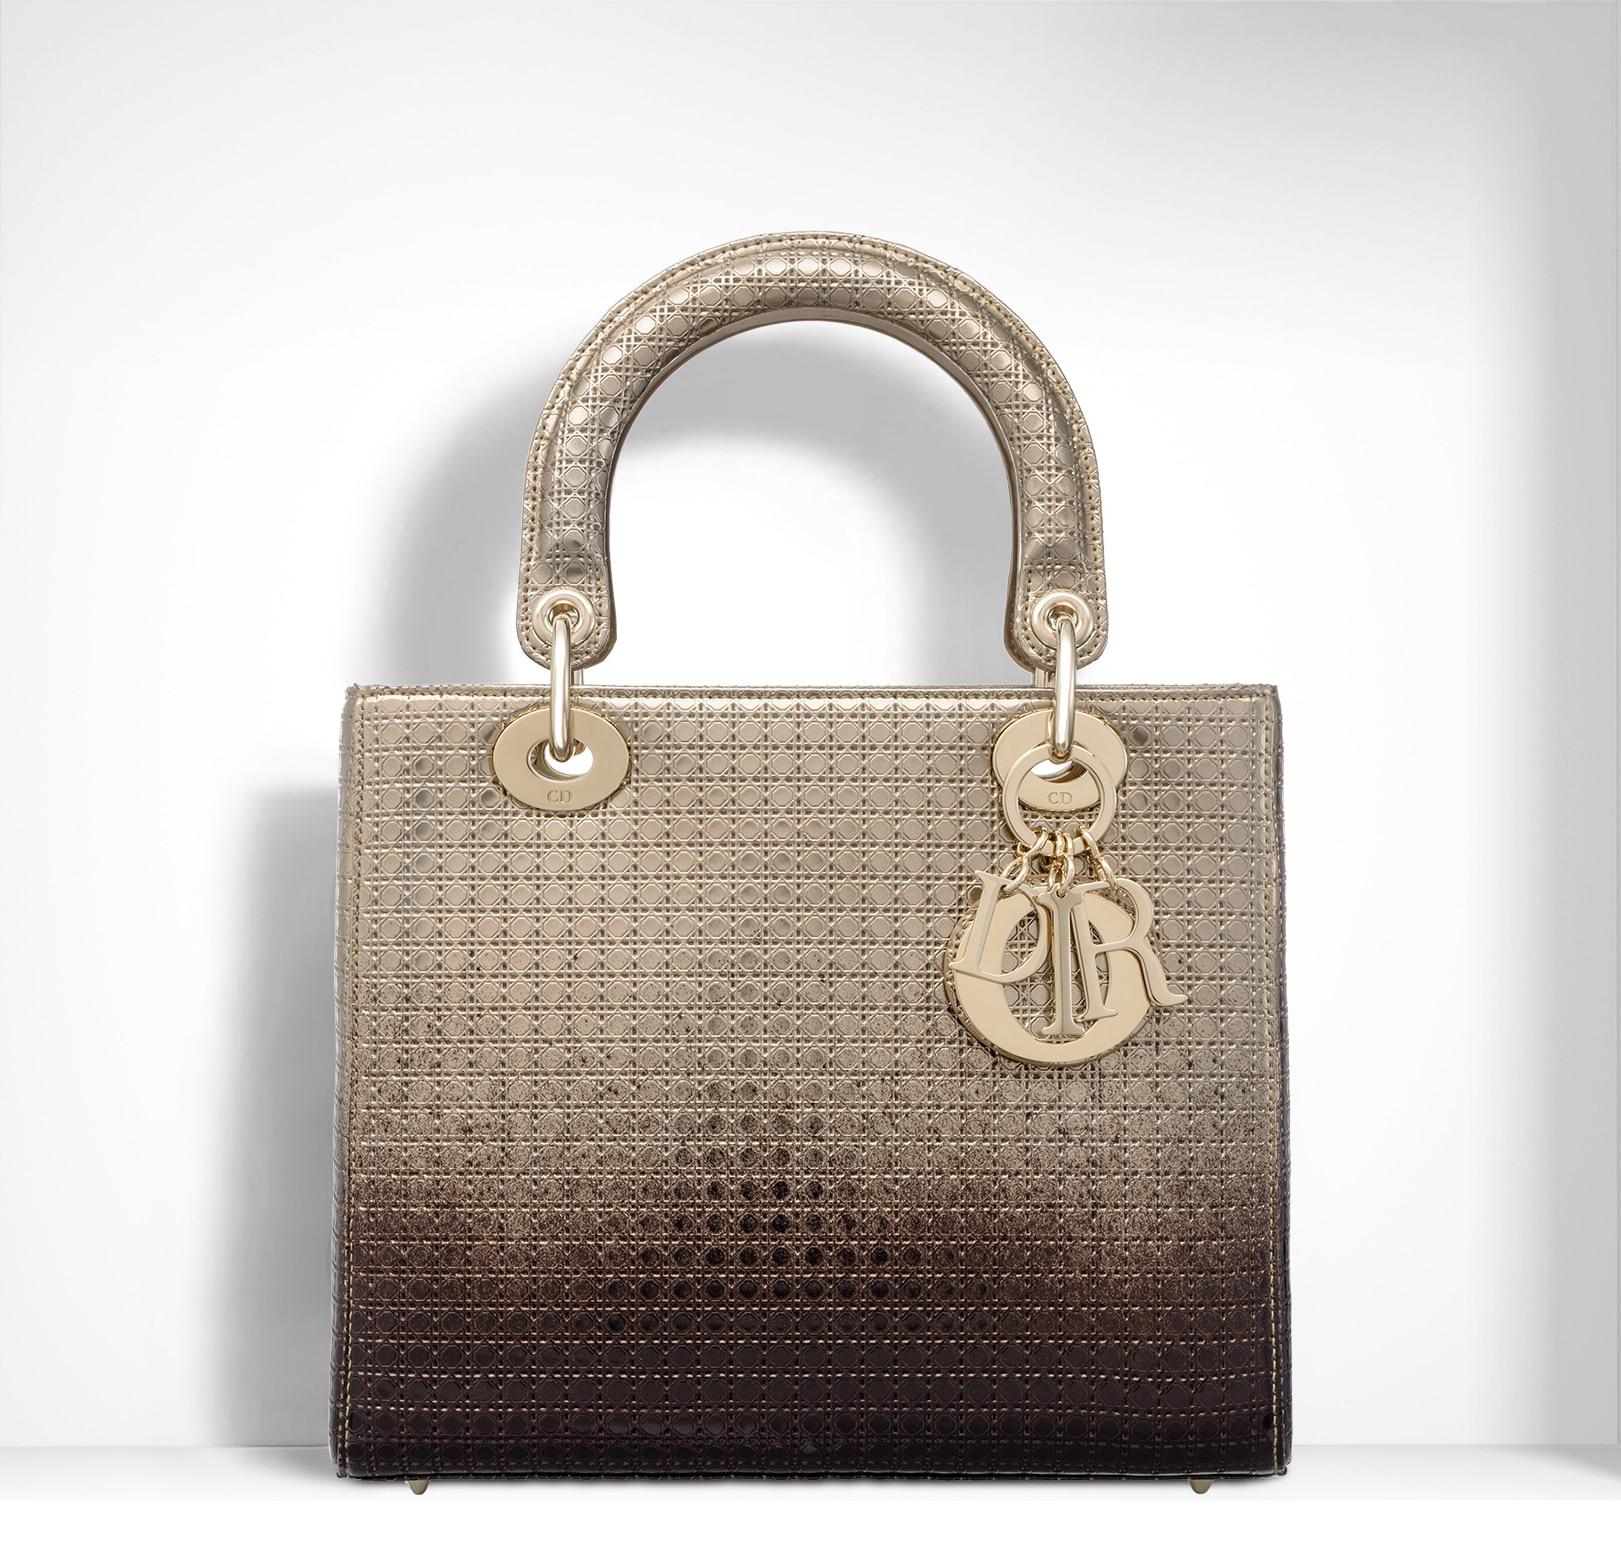 lady dior bag price - photo #29